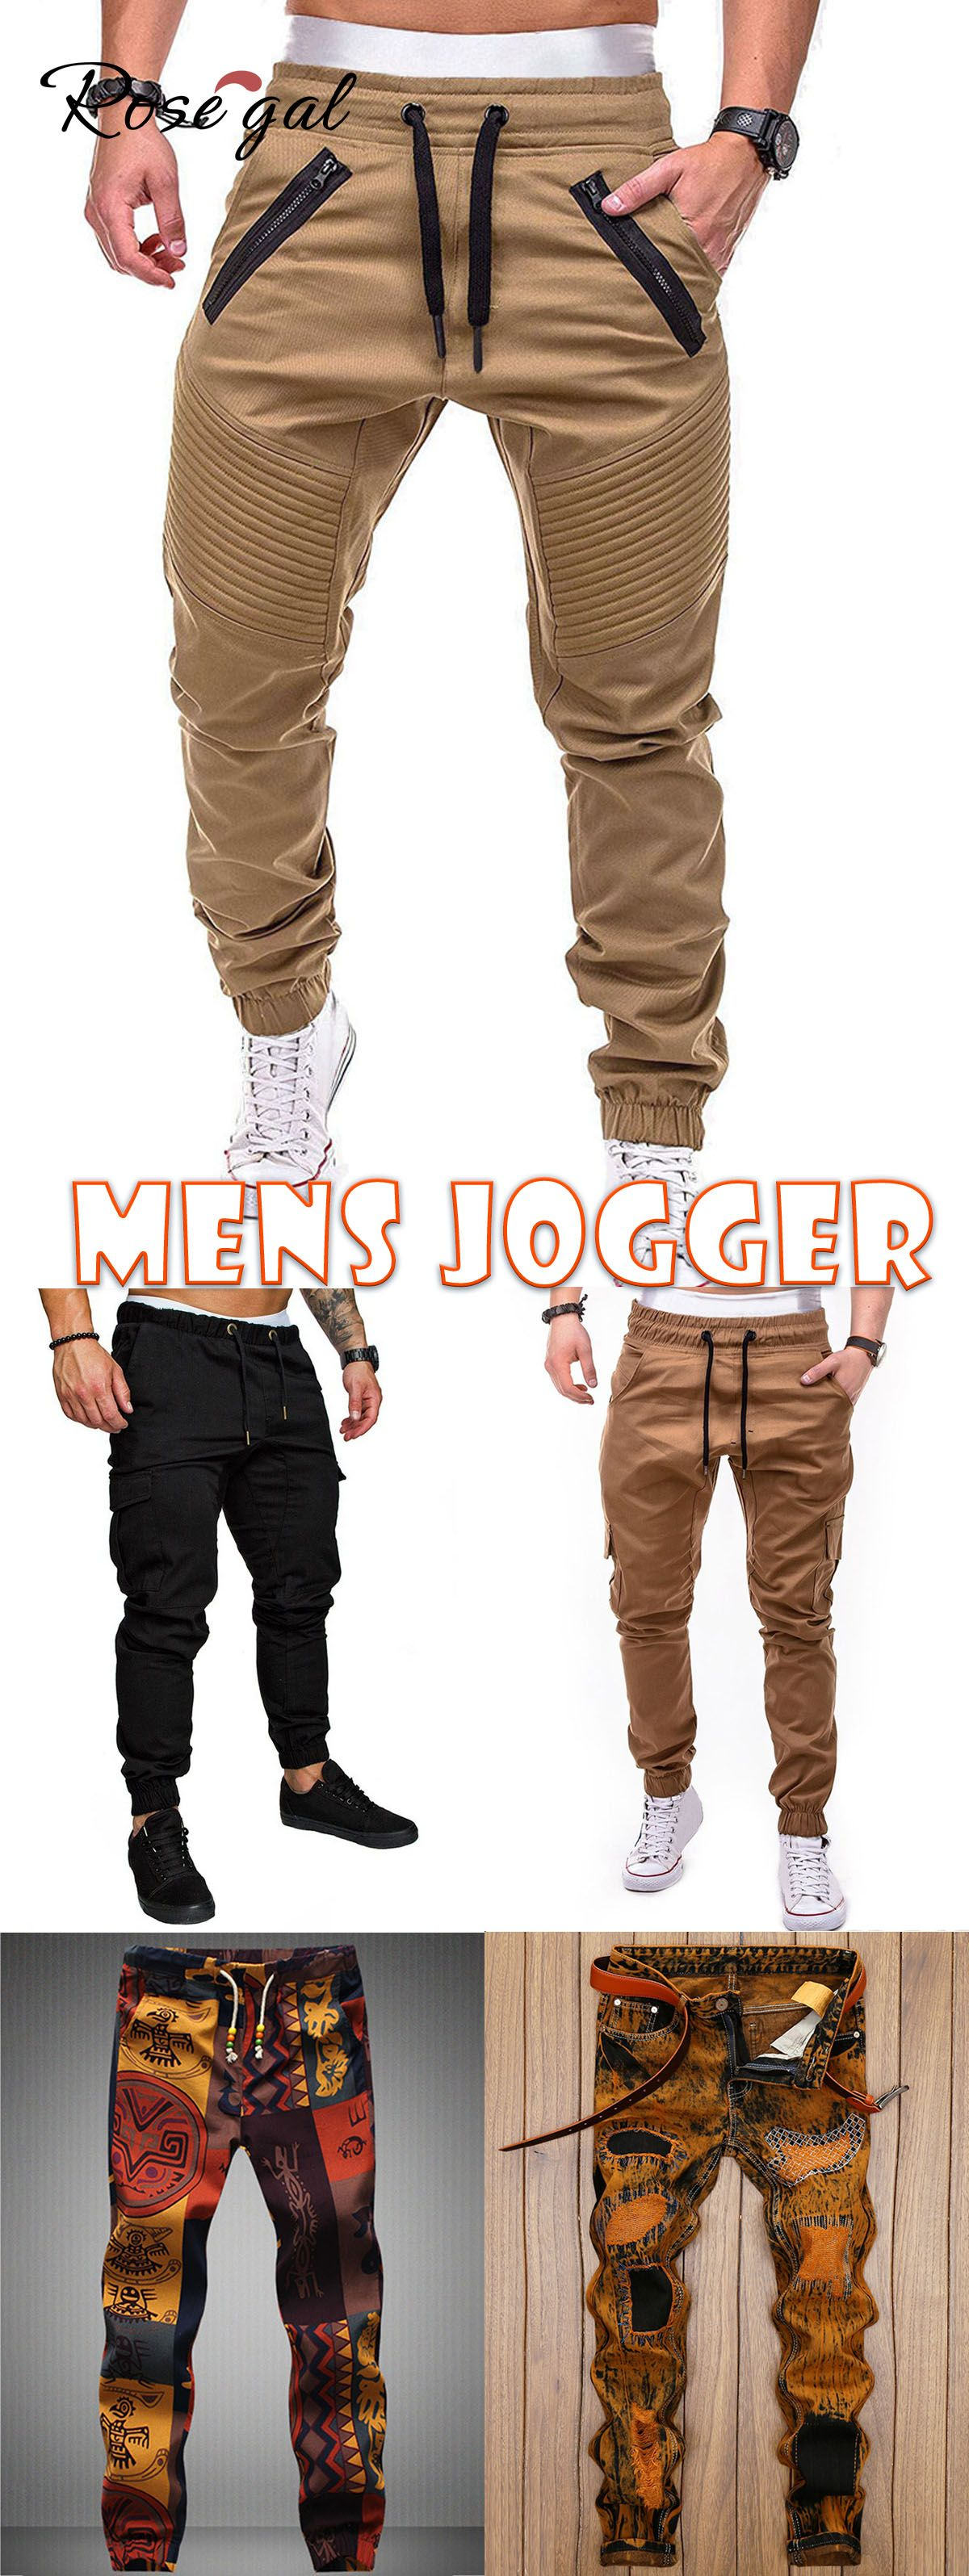 Rosegal Faux Back Pocket Zipper Decorated Jogger Pants